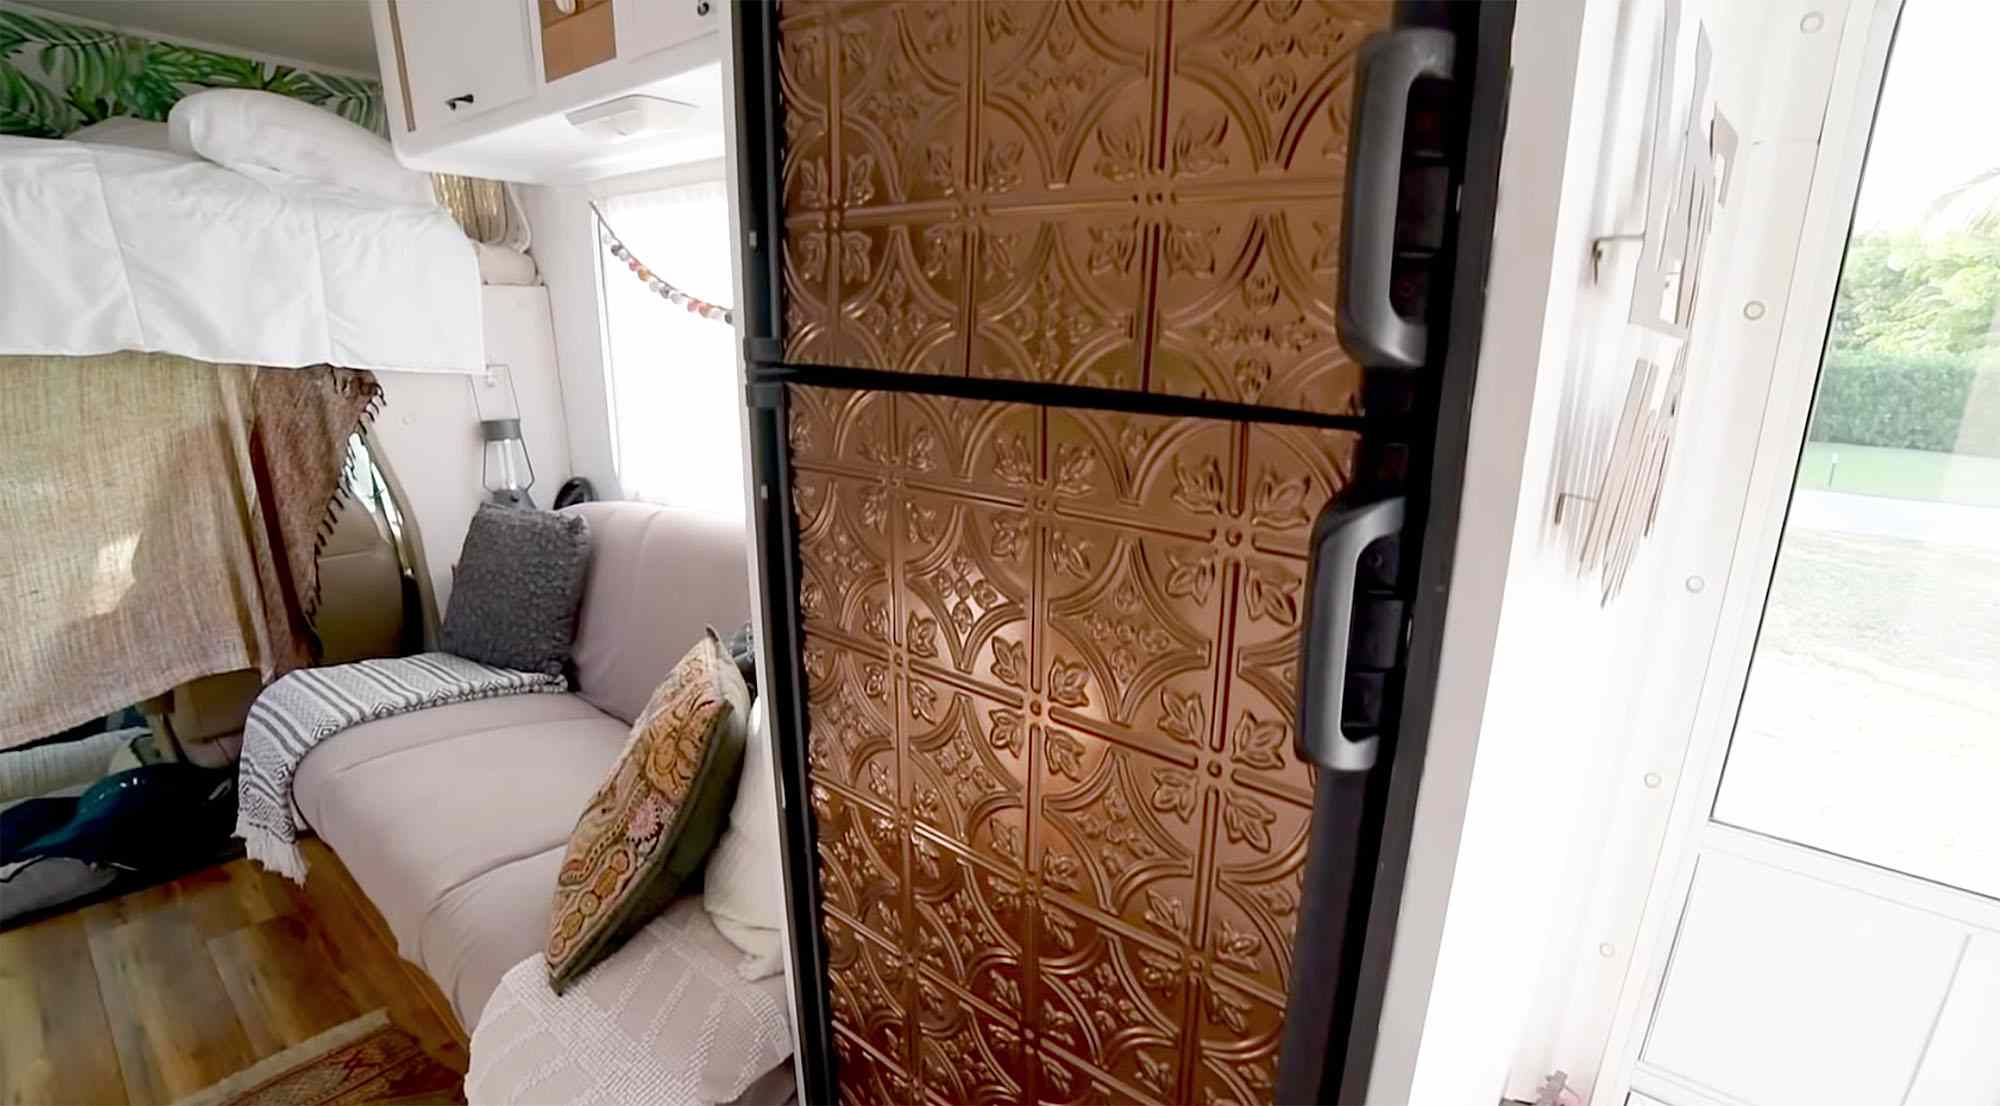 Mandy class c motorhome renovation refrigerator